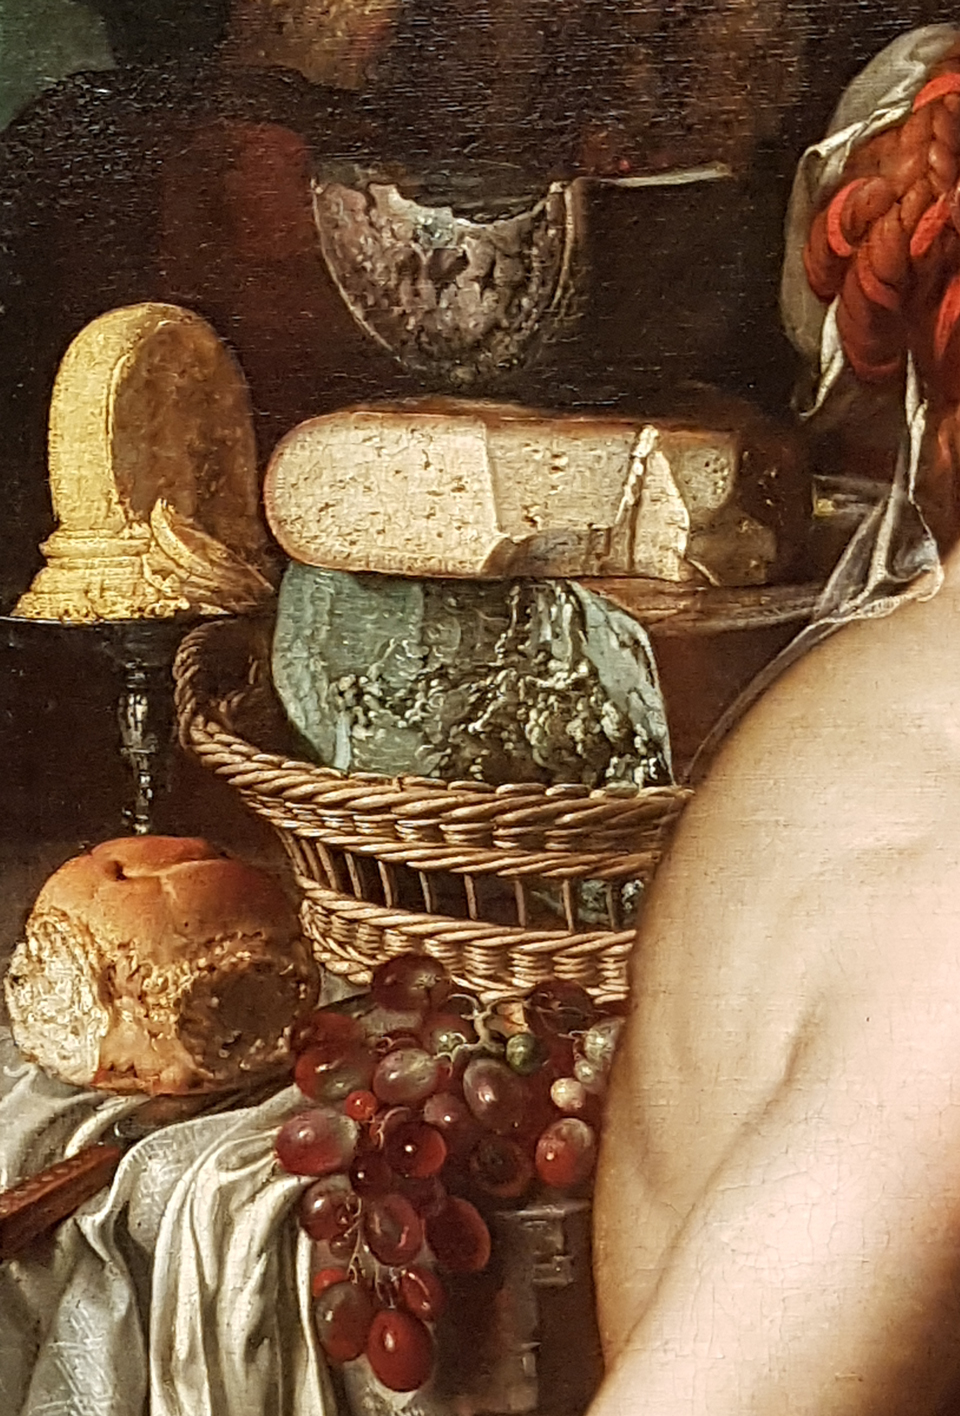 Joachim Wtewael_Lot en zijn dochters 1604